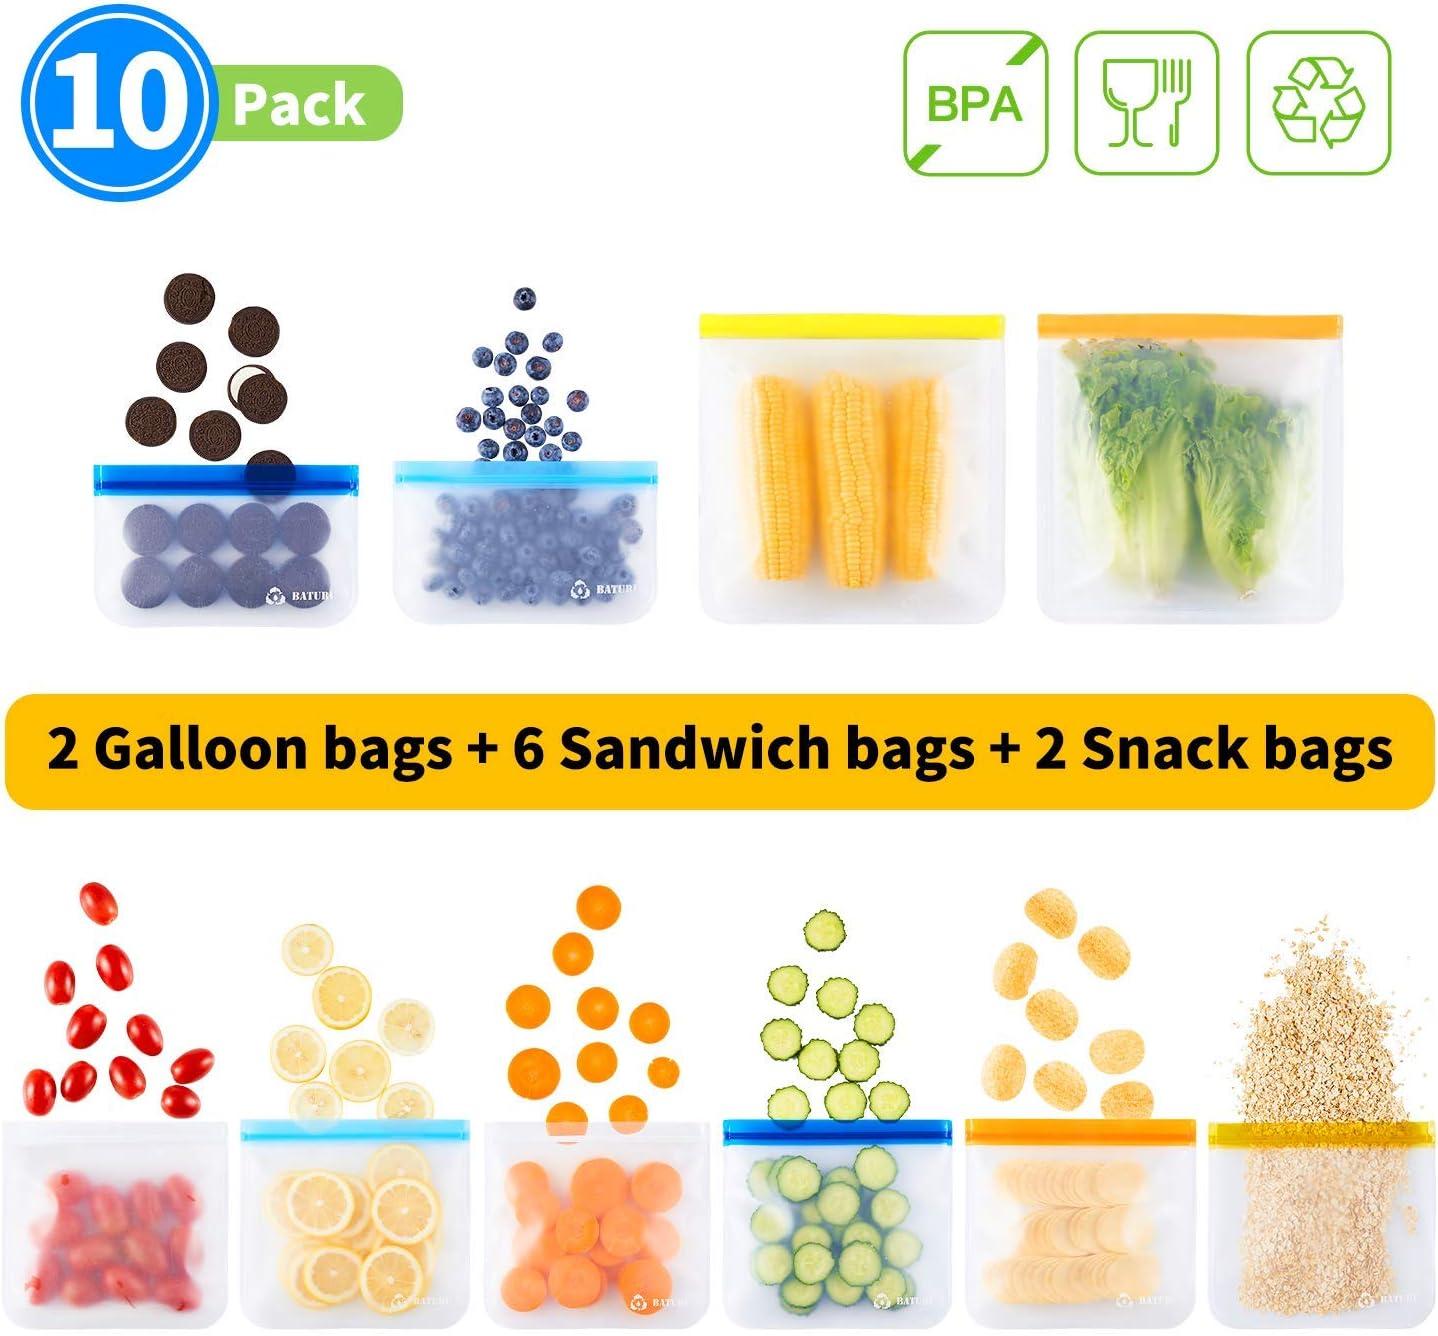 PEVA Reusable Storage Bags 10 Pack, Reusable Ziplock Bags BPA Free (6 PEVA Reusable Sandwich Bags + 4 PEVA Reusable Snack Bags), PEVA Reusable Lunch Bags for Food